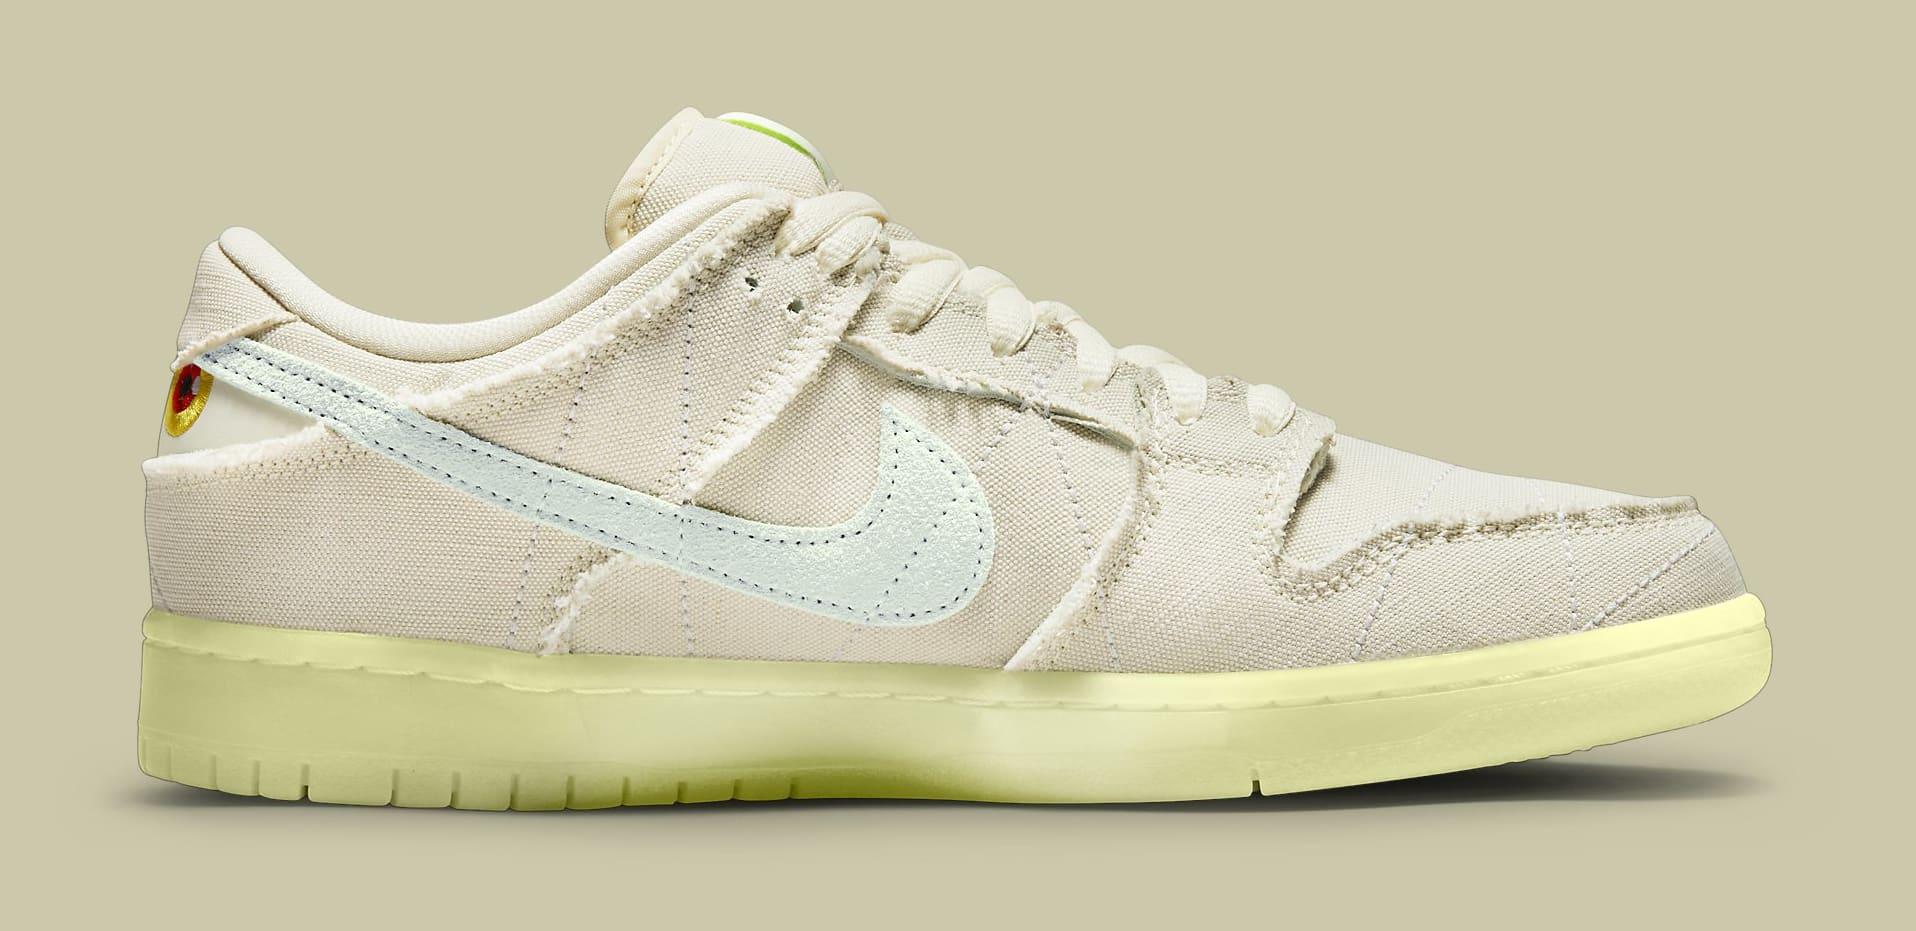 Nike SB Dunk Low 'Mummy' DM0774-111 Medial